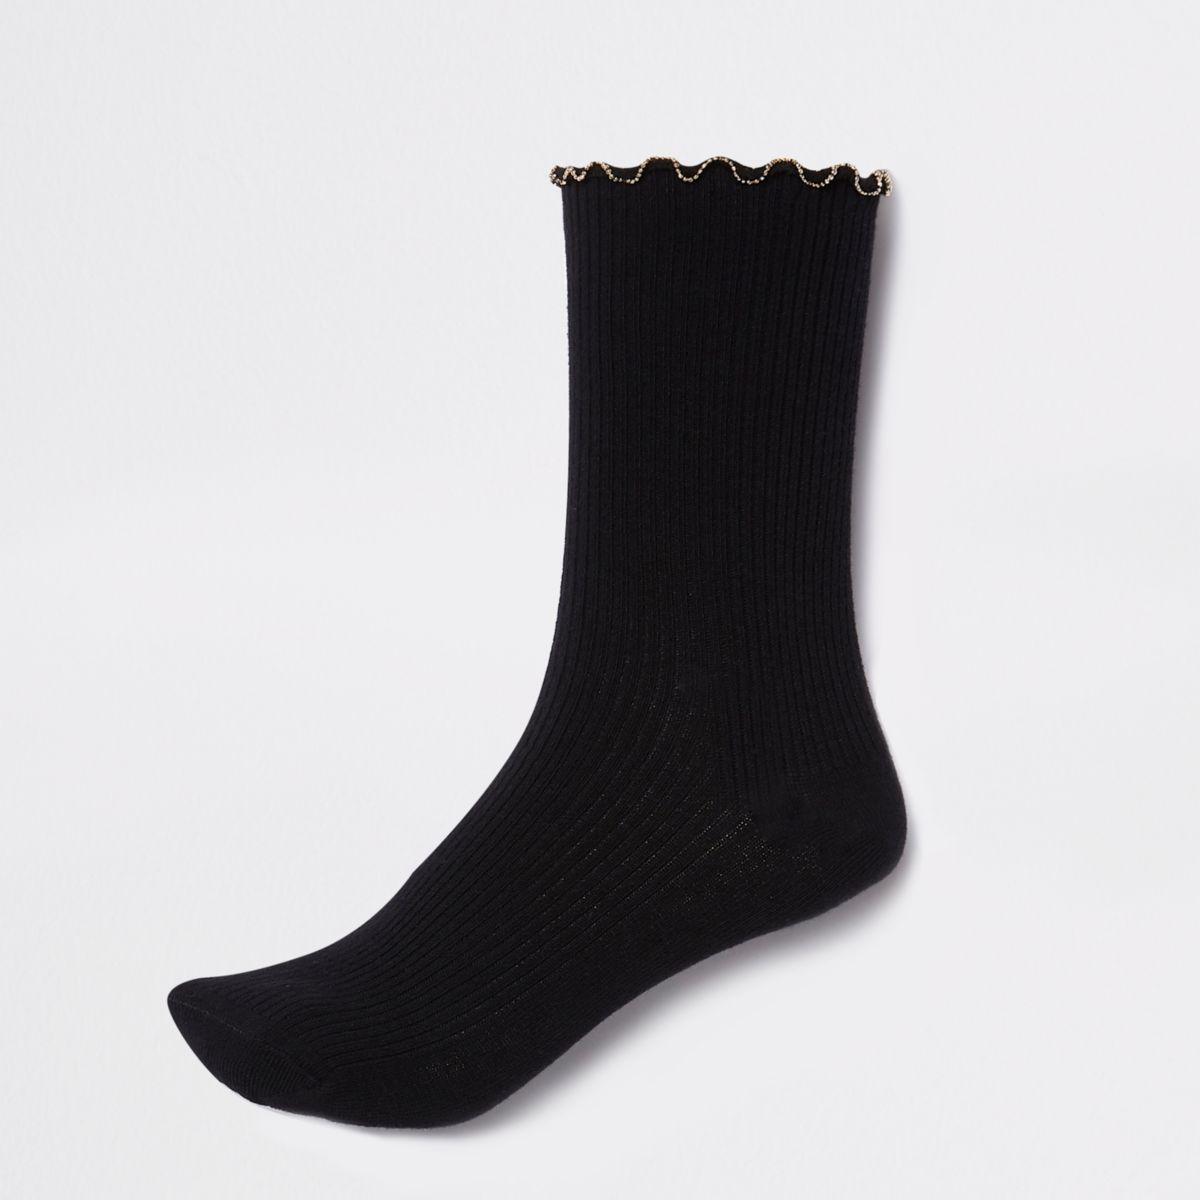 Zwarte geribbelde enkelsokken met ketting langs de zoom